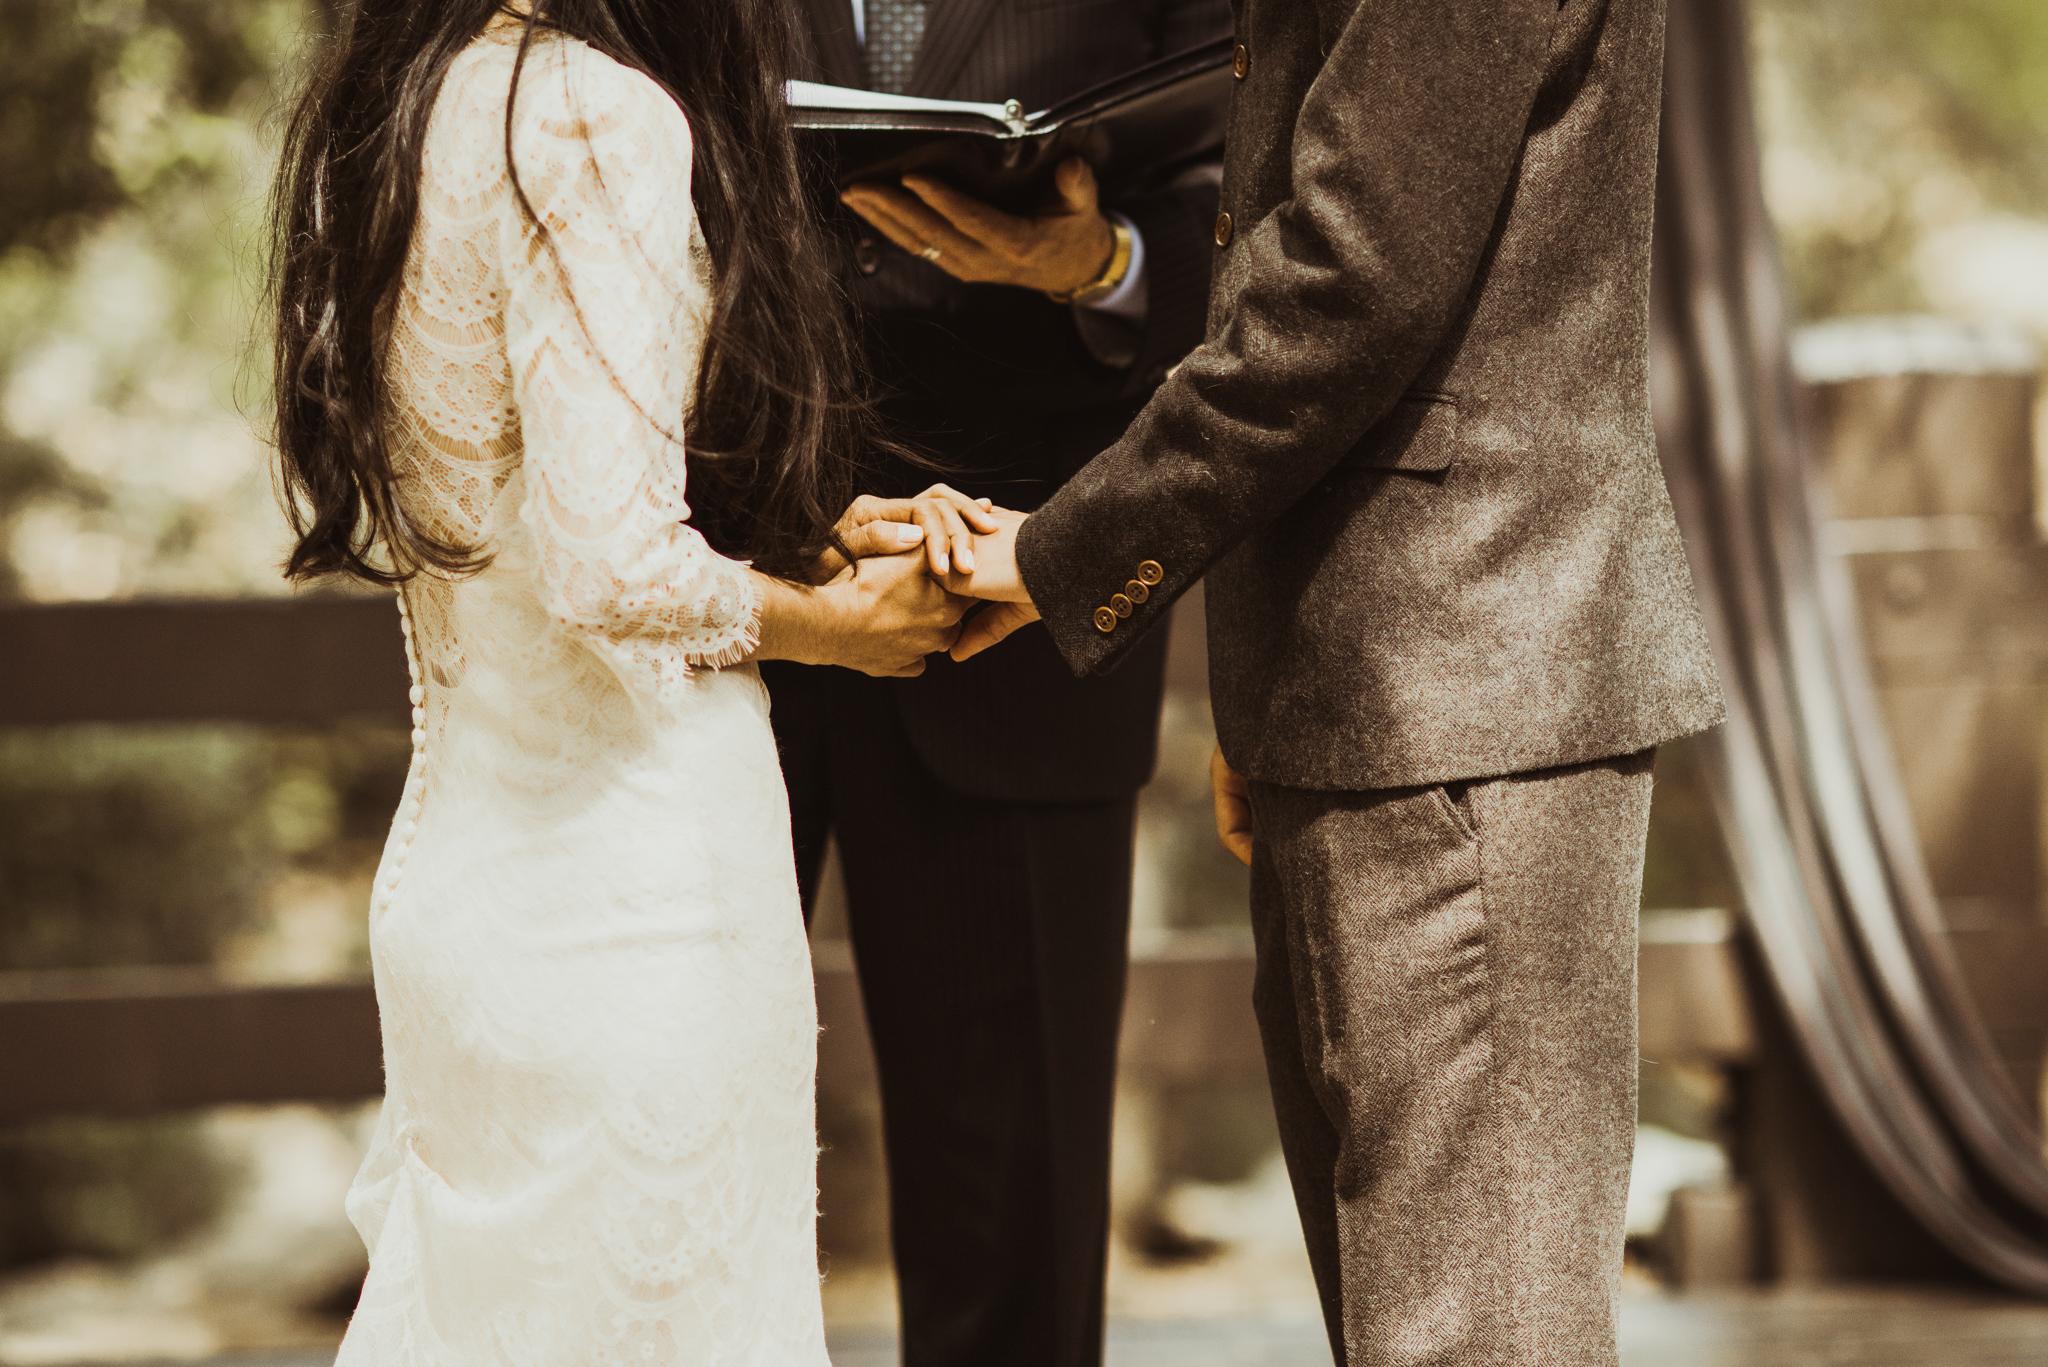 ©Isaiah-&-Taylor-Photography---Oak-Canyon-Nature-Center-Wedding,-Anaheim-Hills-048.jpg